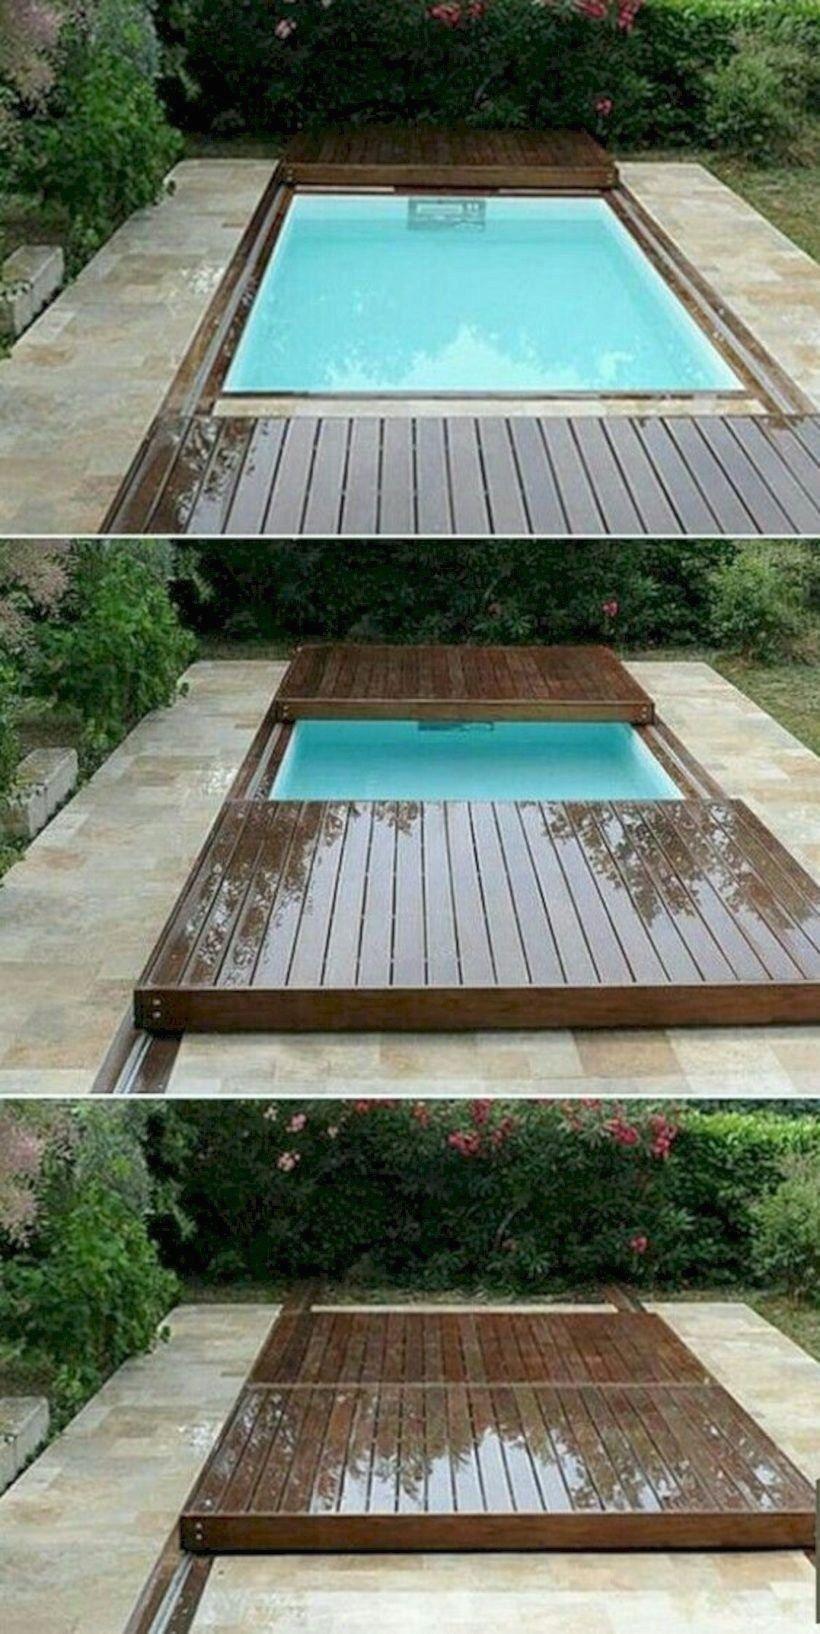 16 Decorating Tiny Pool on Your Backyard Garden - GODIYGO.COM - Modern Design